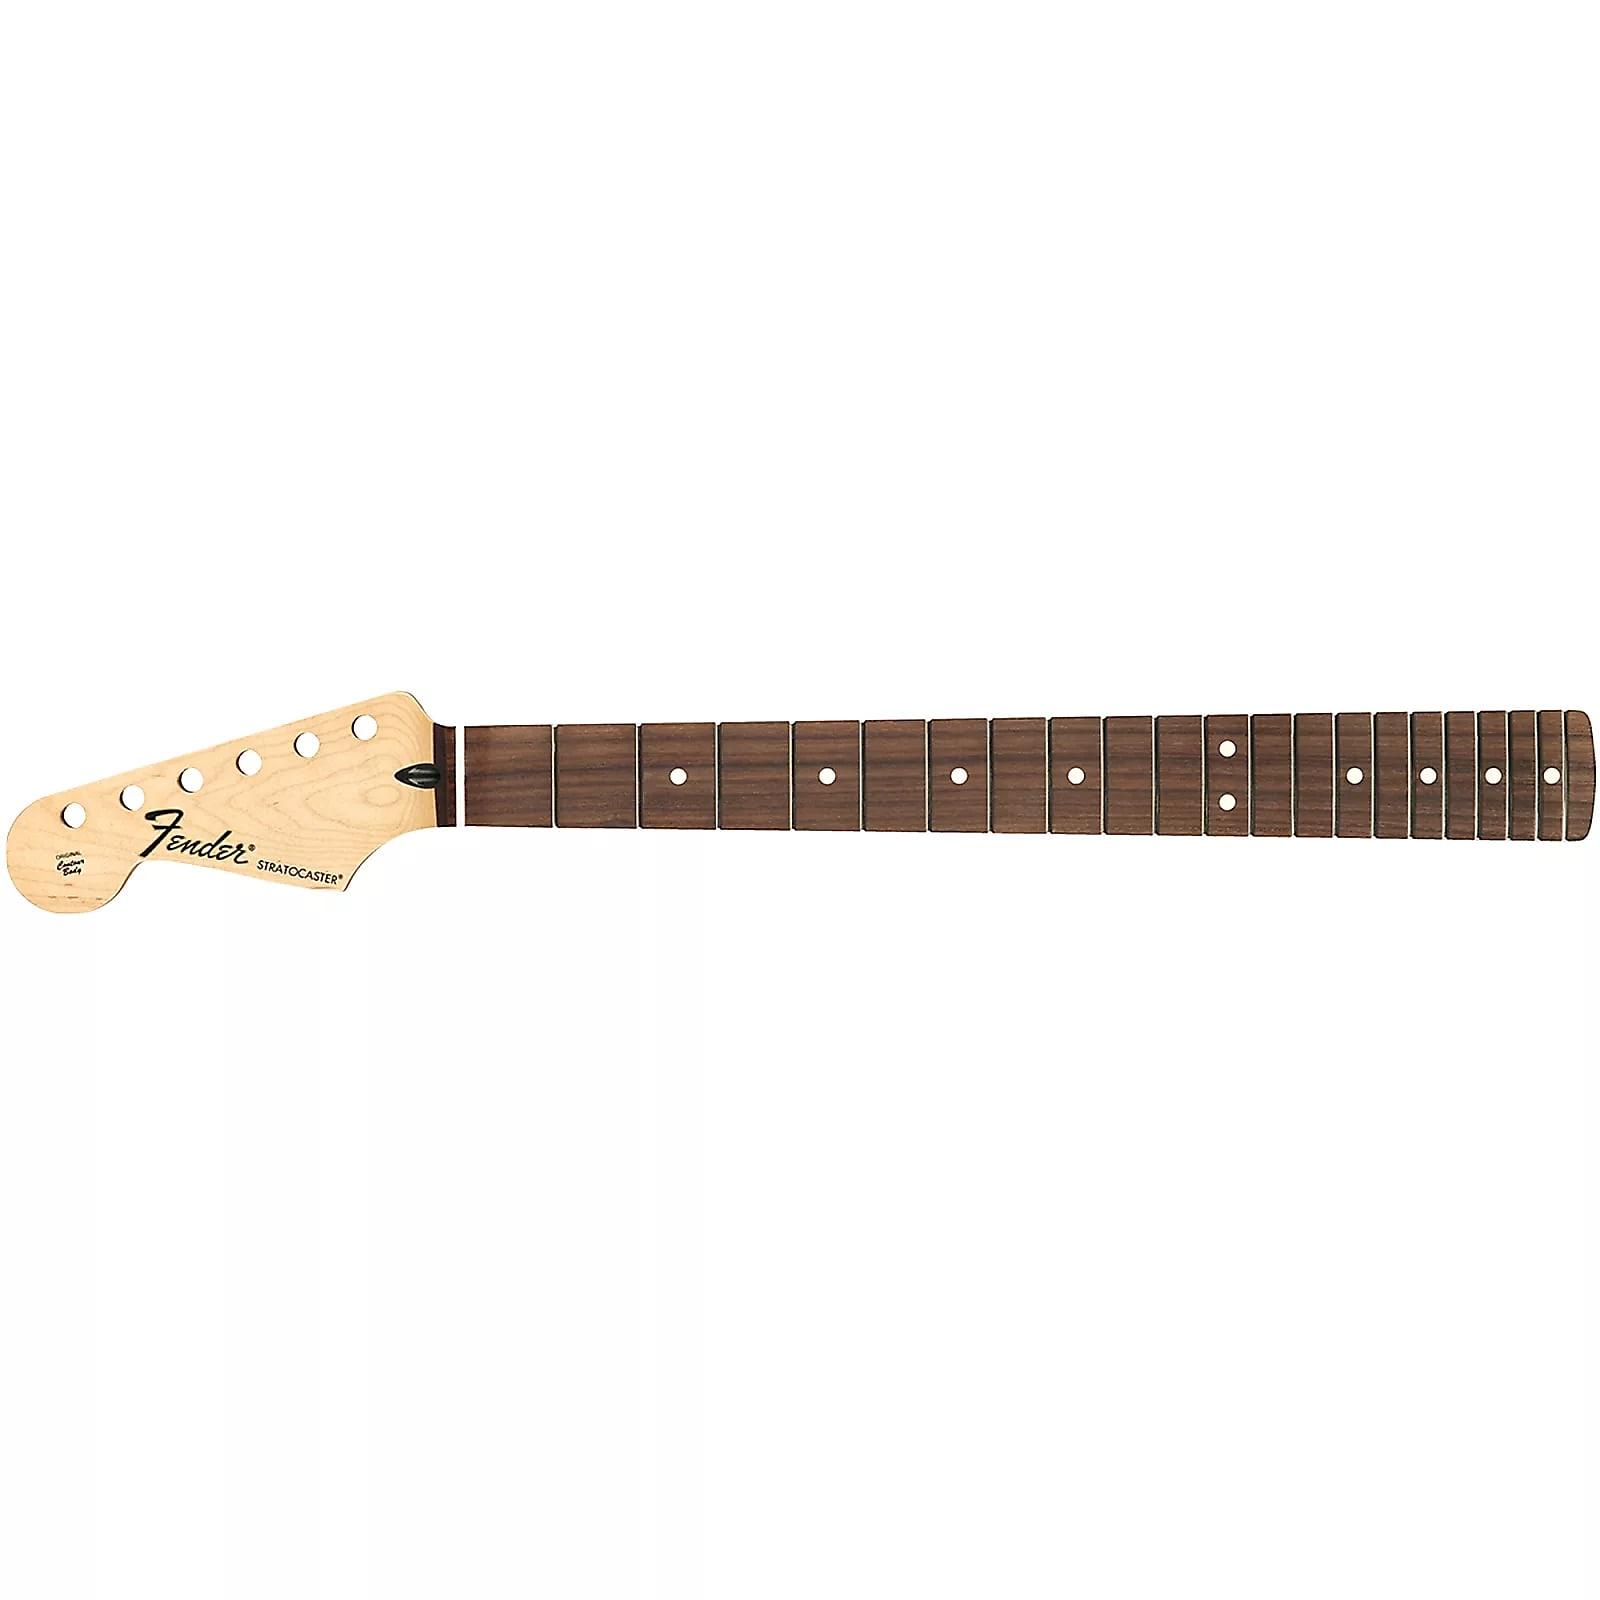 NEW LEFTY Fender Standard Stratocaster Strat NECK Pau Ferro 0994623921